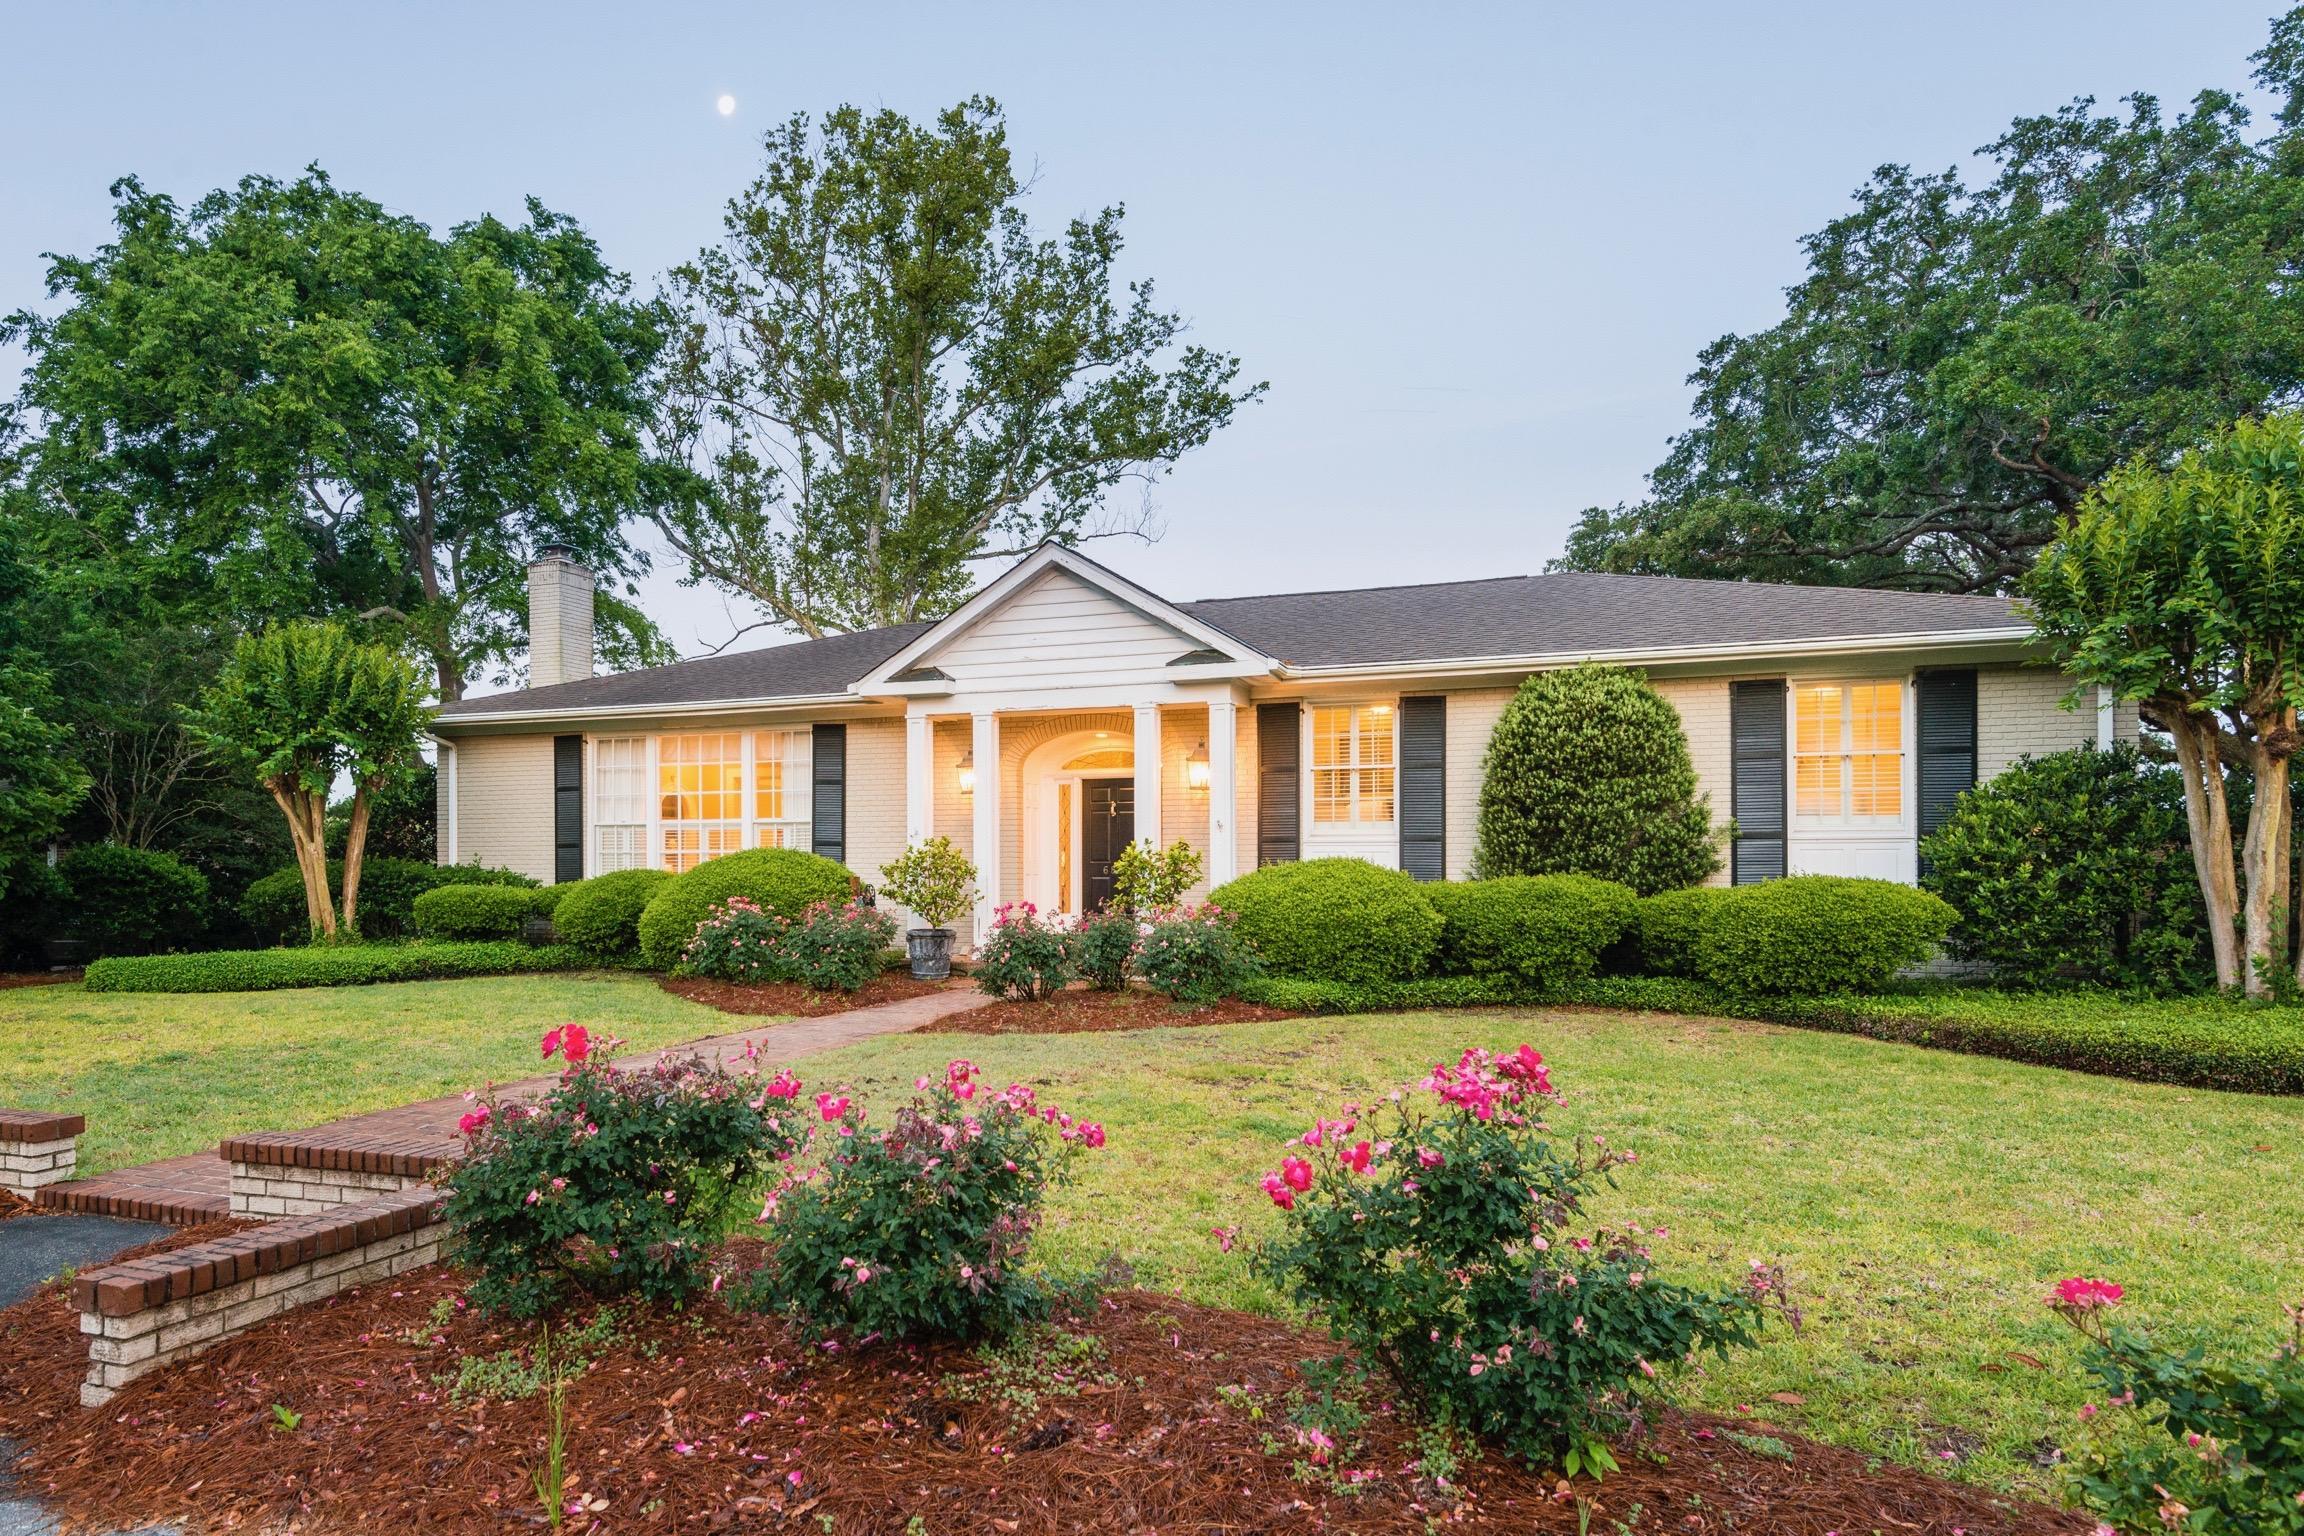 Lawton Bluff Homes For Sale - 685 Shore, Charleston, SC - 0